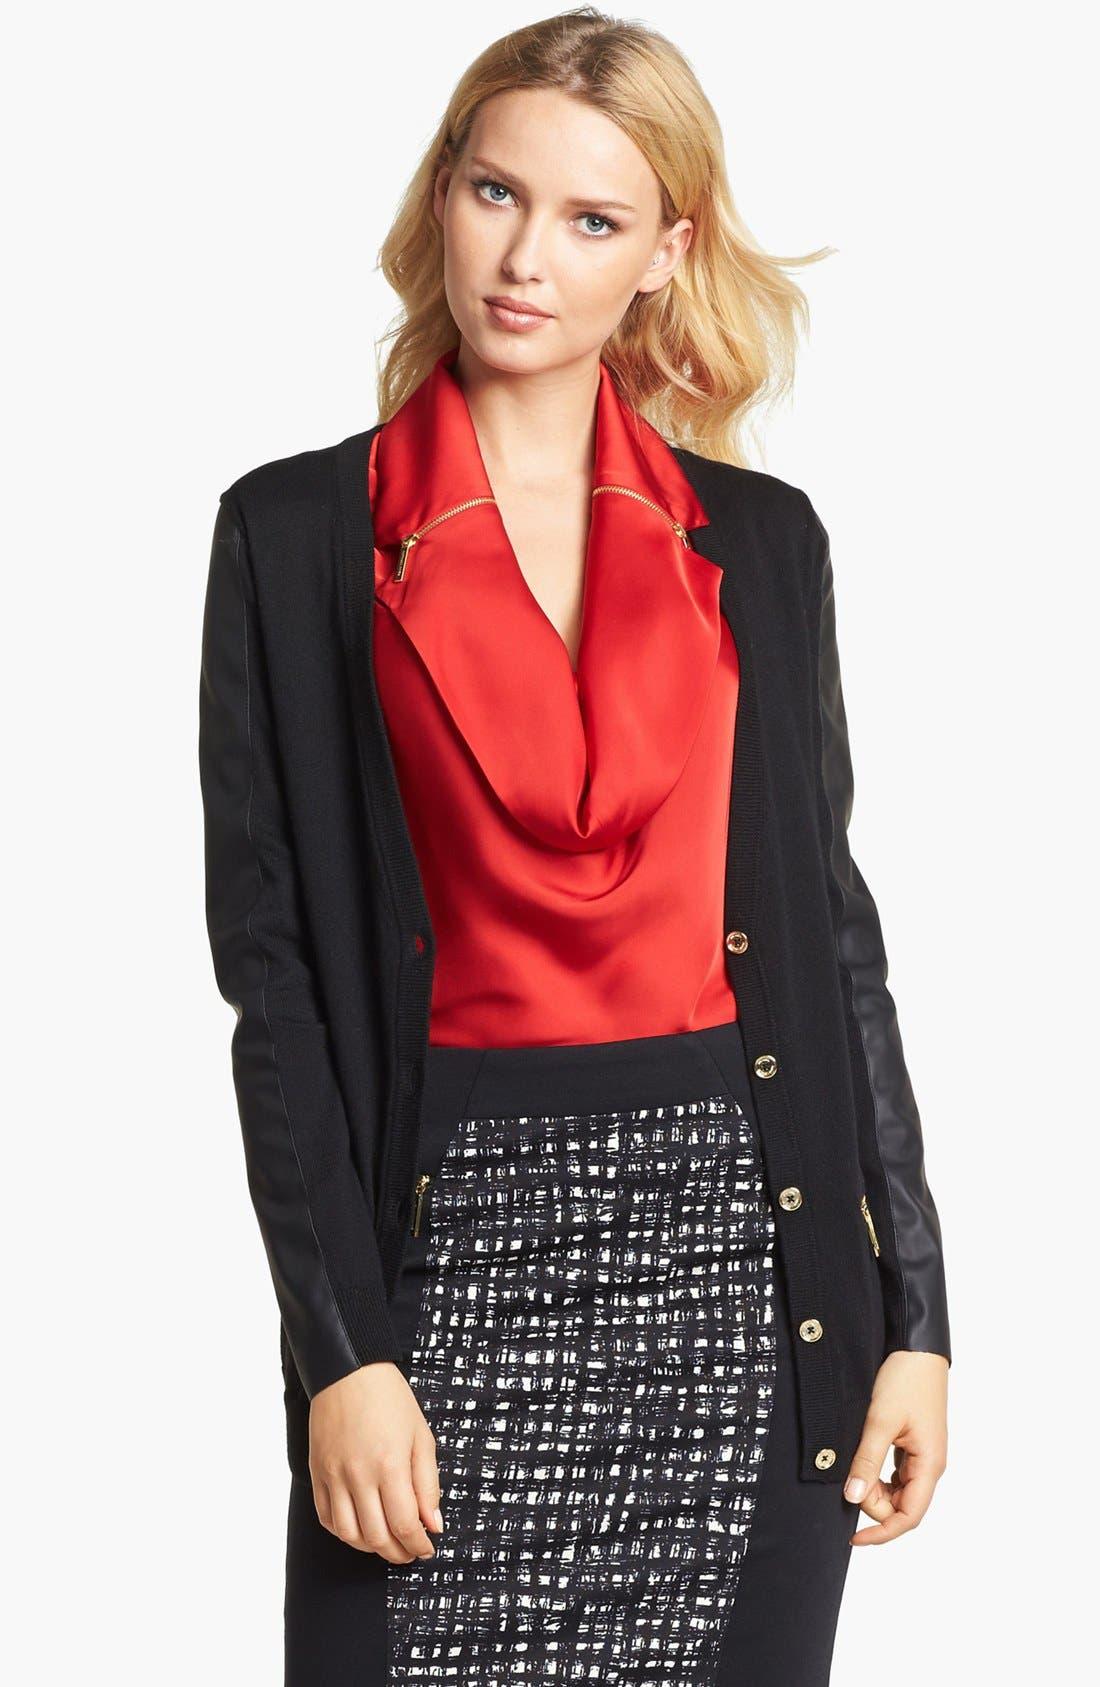 Alternate Image 1 Selected - MICHAEL Michael Kors Faux Leather Sleeve V-Neck Cardigan (Petite)